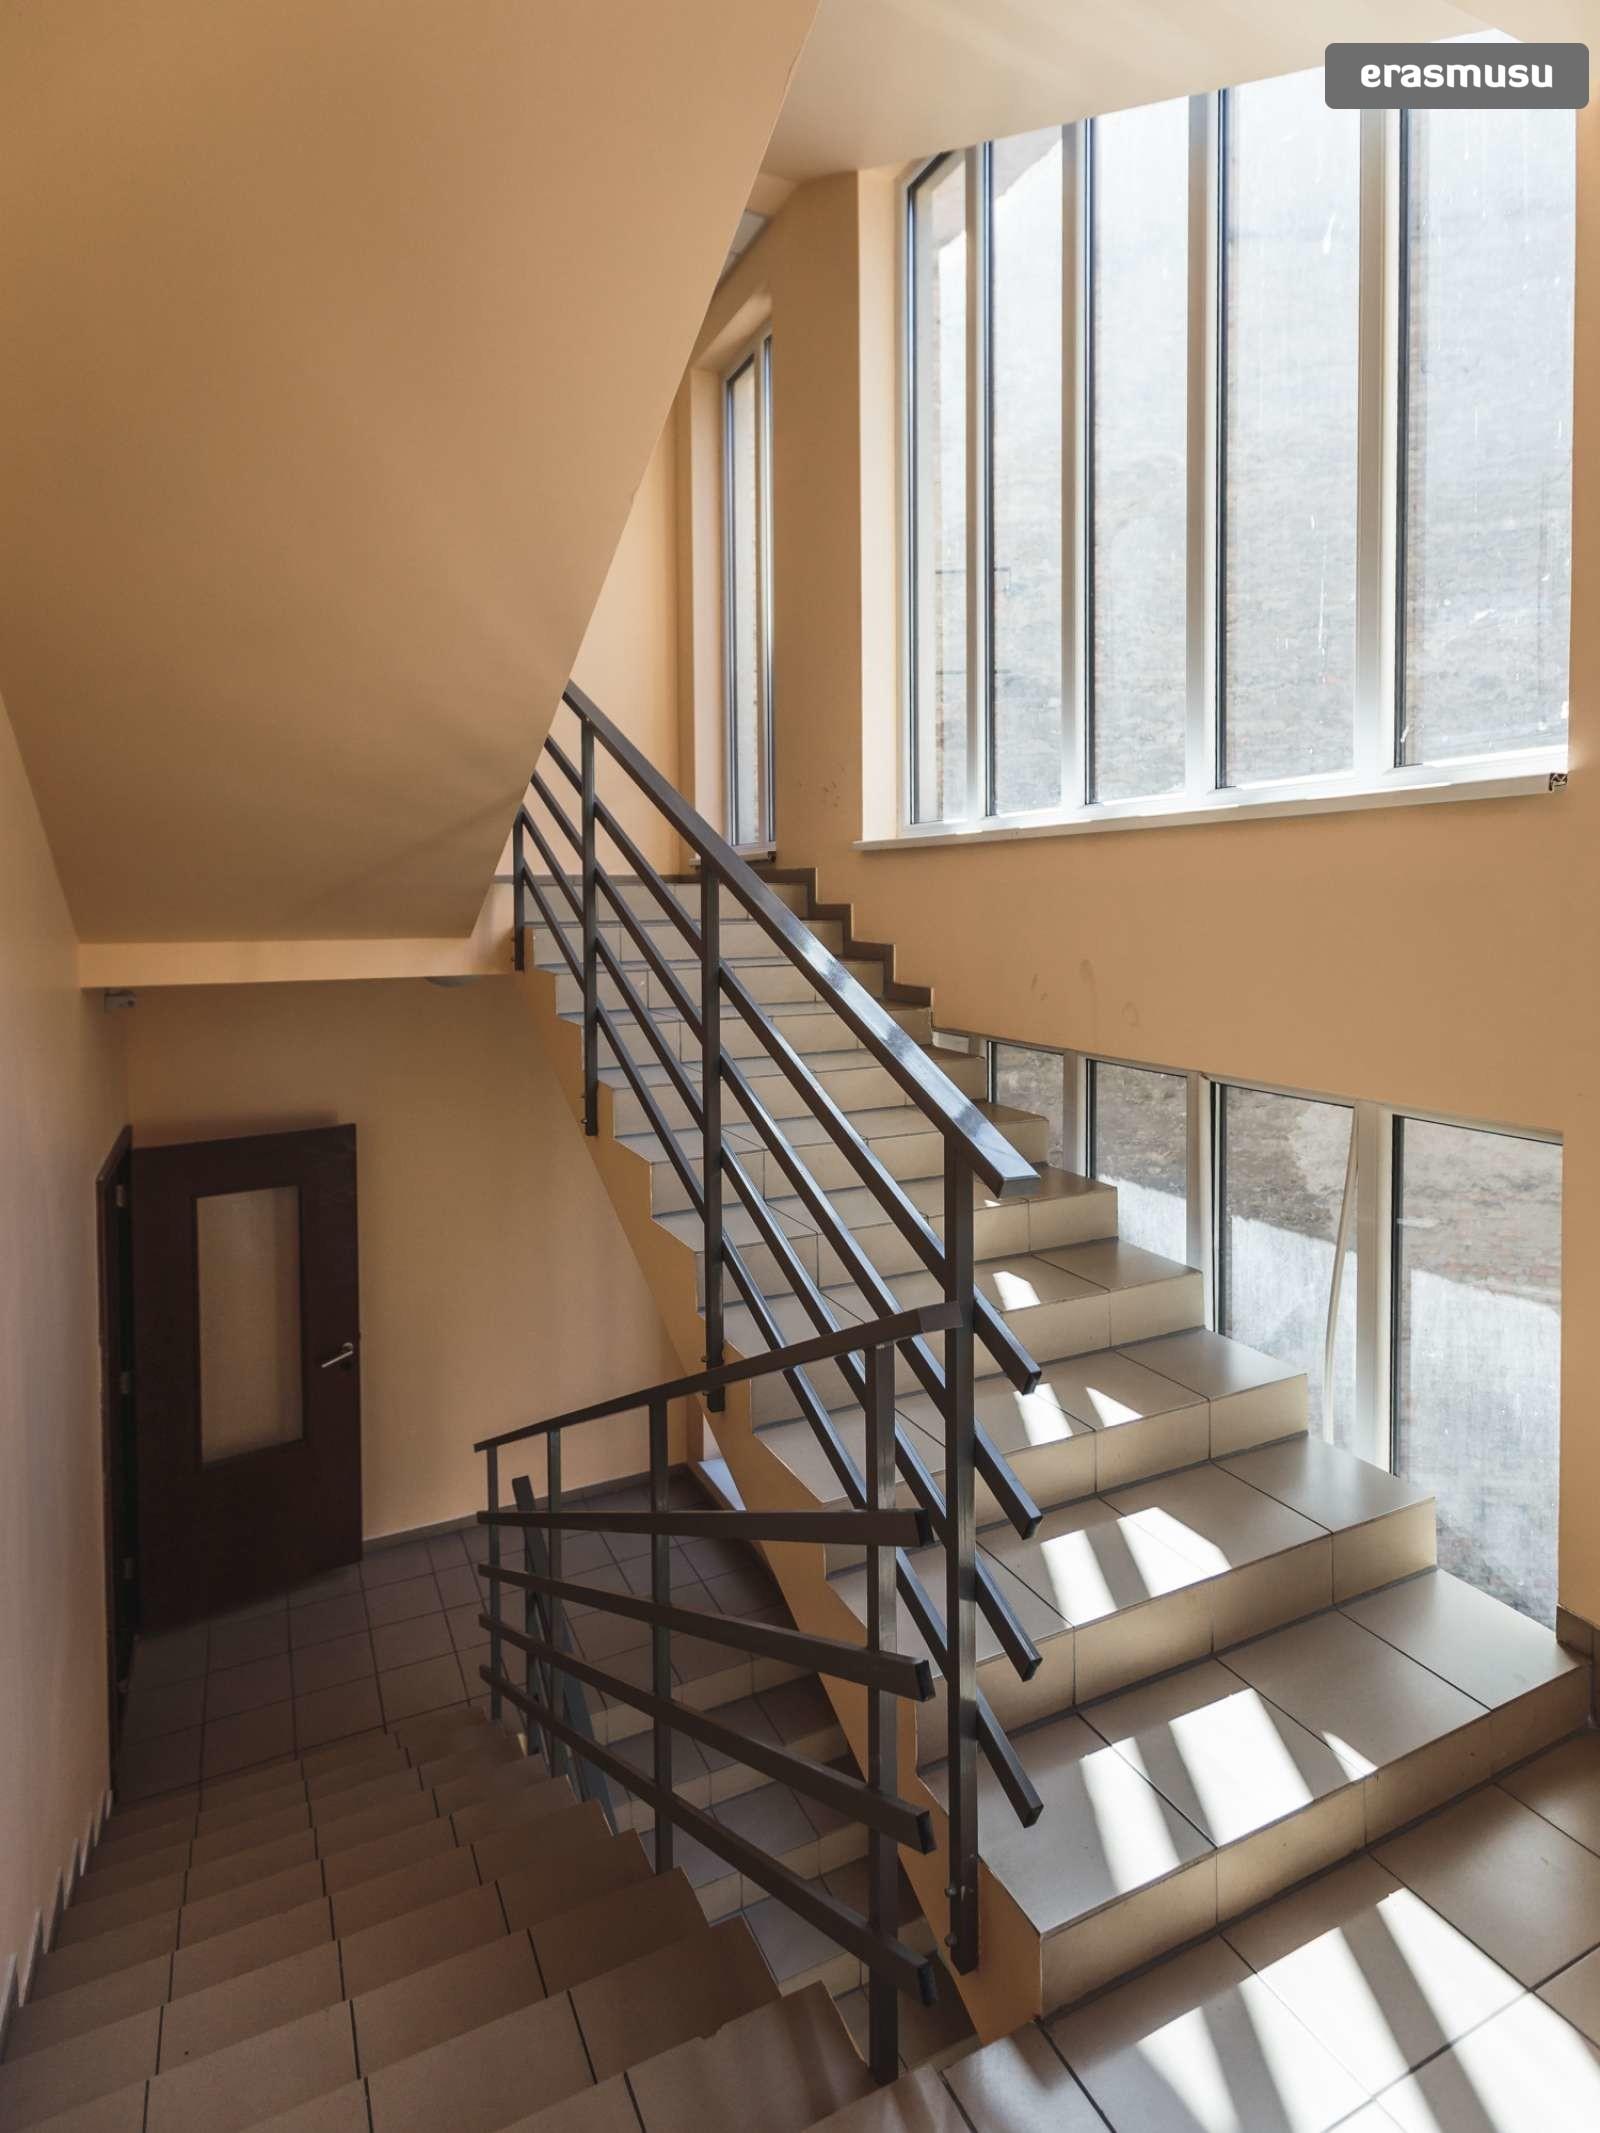 1-bedroom-apartment-rent-maskavas-forstate-6fc4ca8c2b6933831afac